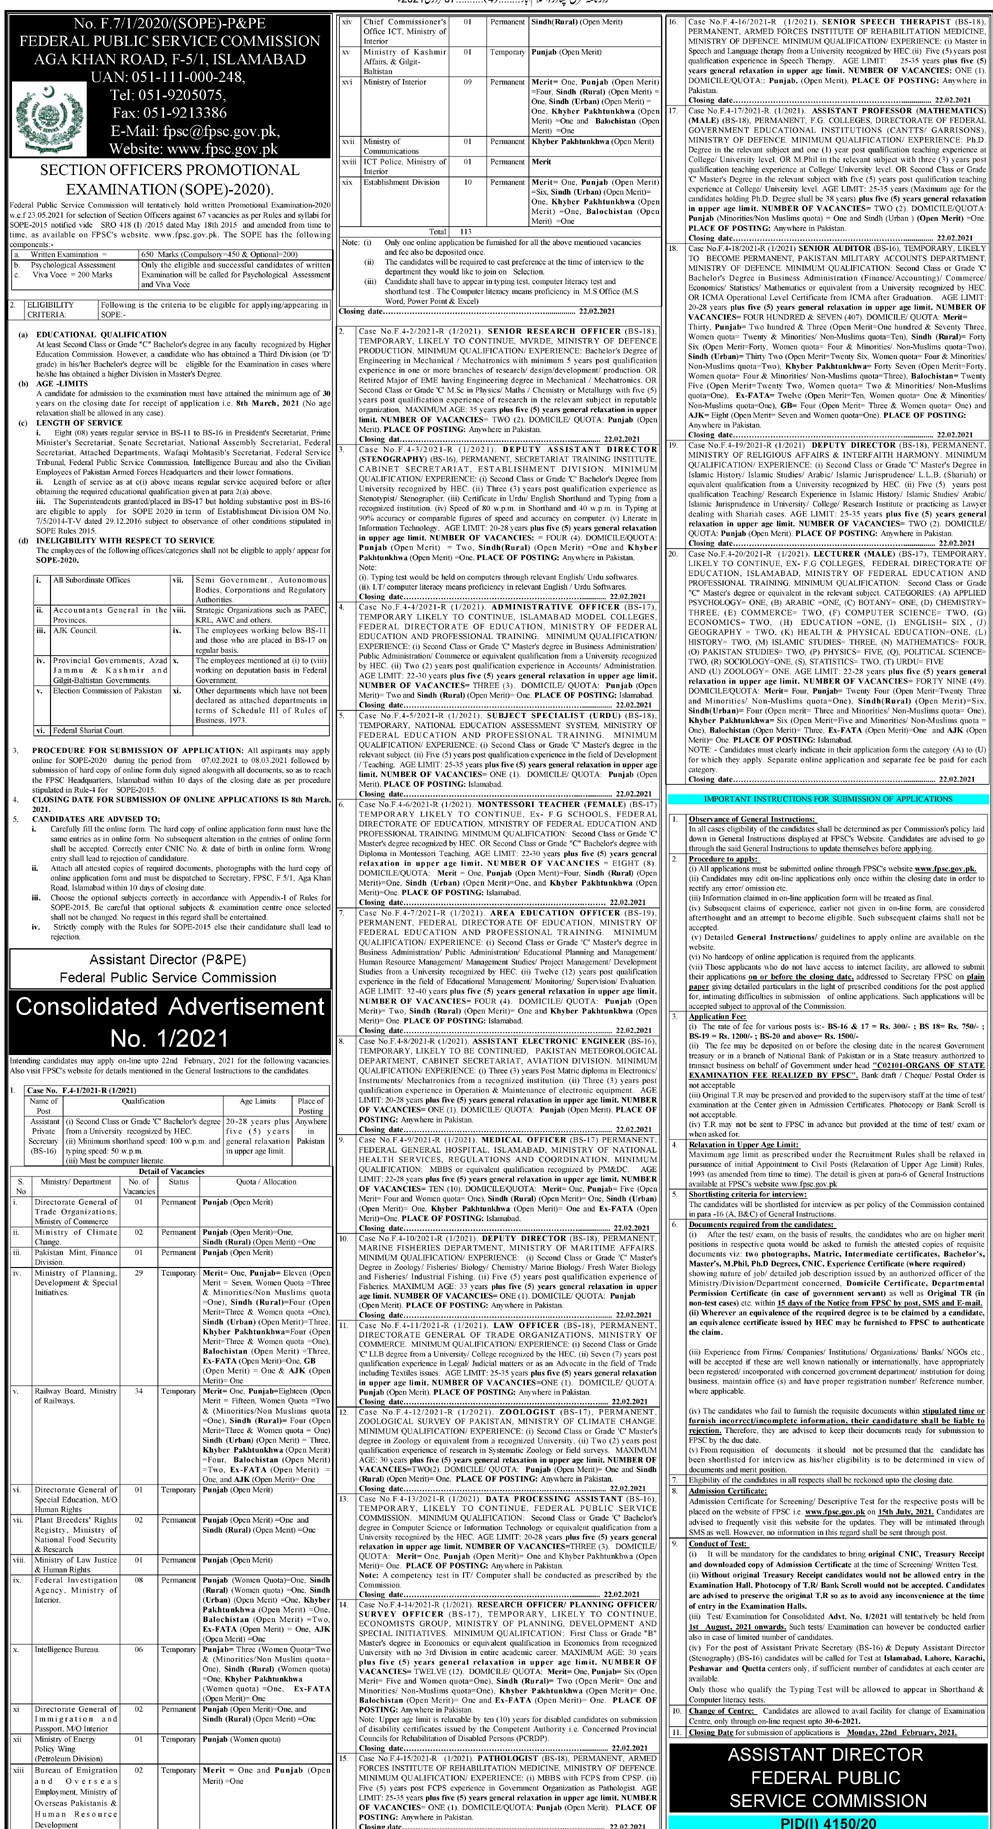 Download Fereral Public Service Commission FPSC Jobs 2021 Application Form - www.fpsc.gov.pk - FPSC New Jobs - FPSC Latest Jobs - Federal Public Service Commission Jobs